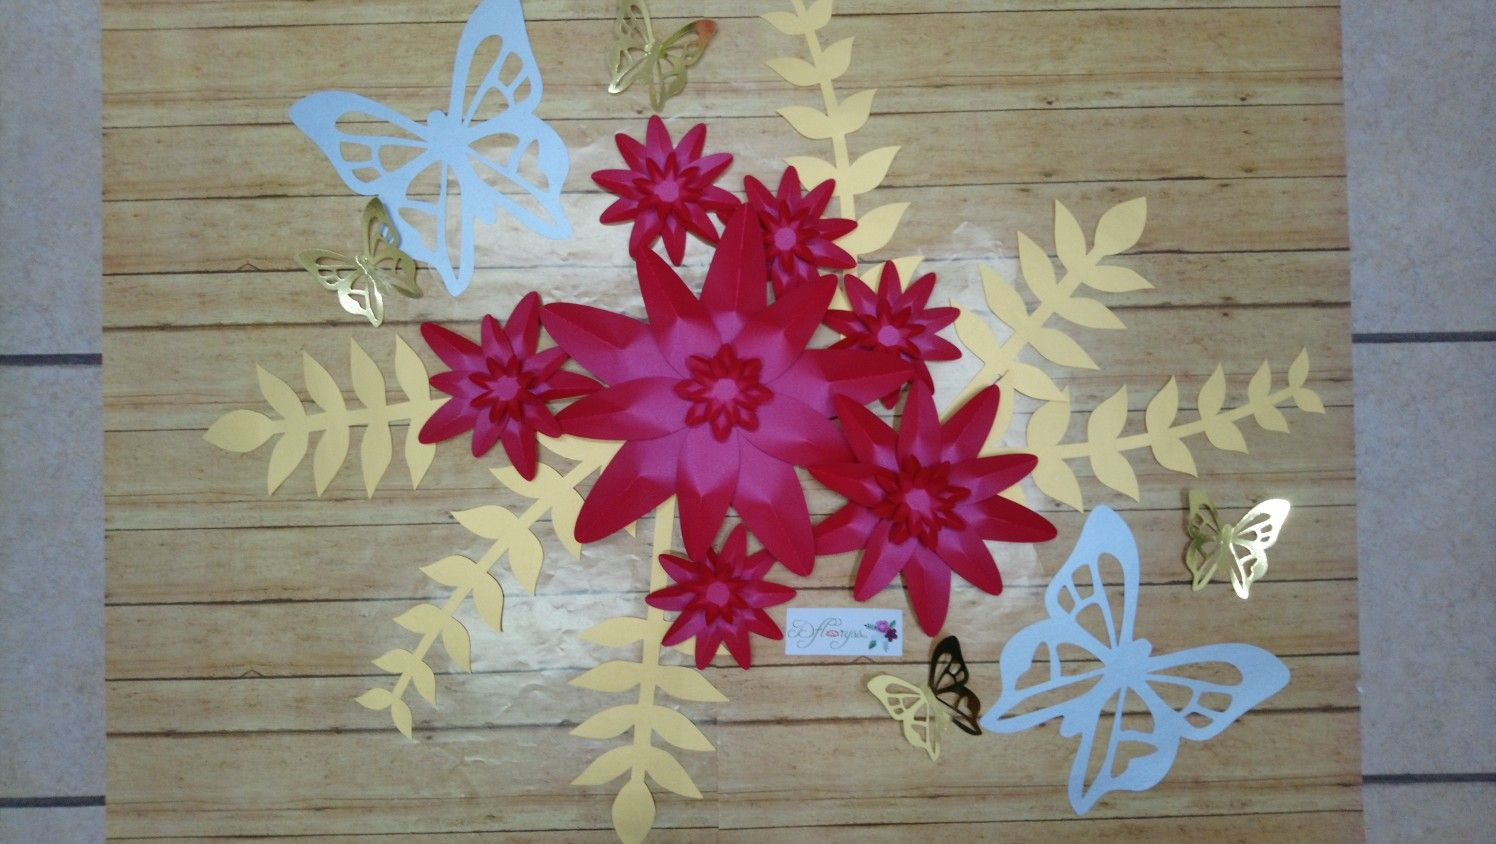 Flores de papel modelo margarita httpsfacebookdfloryss flores de papel modelo margarita httpsfacebookdfloryss mightylinksfo